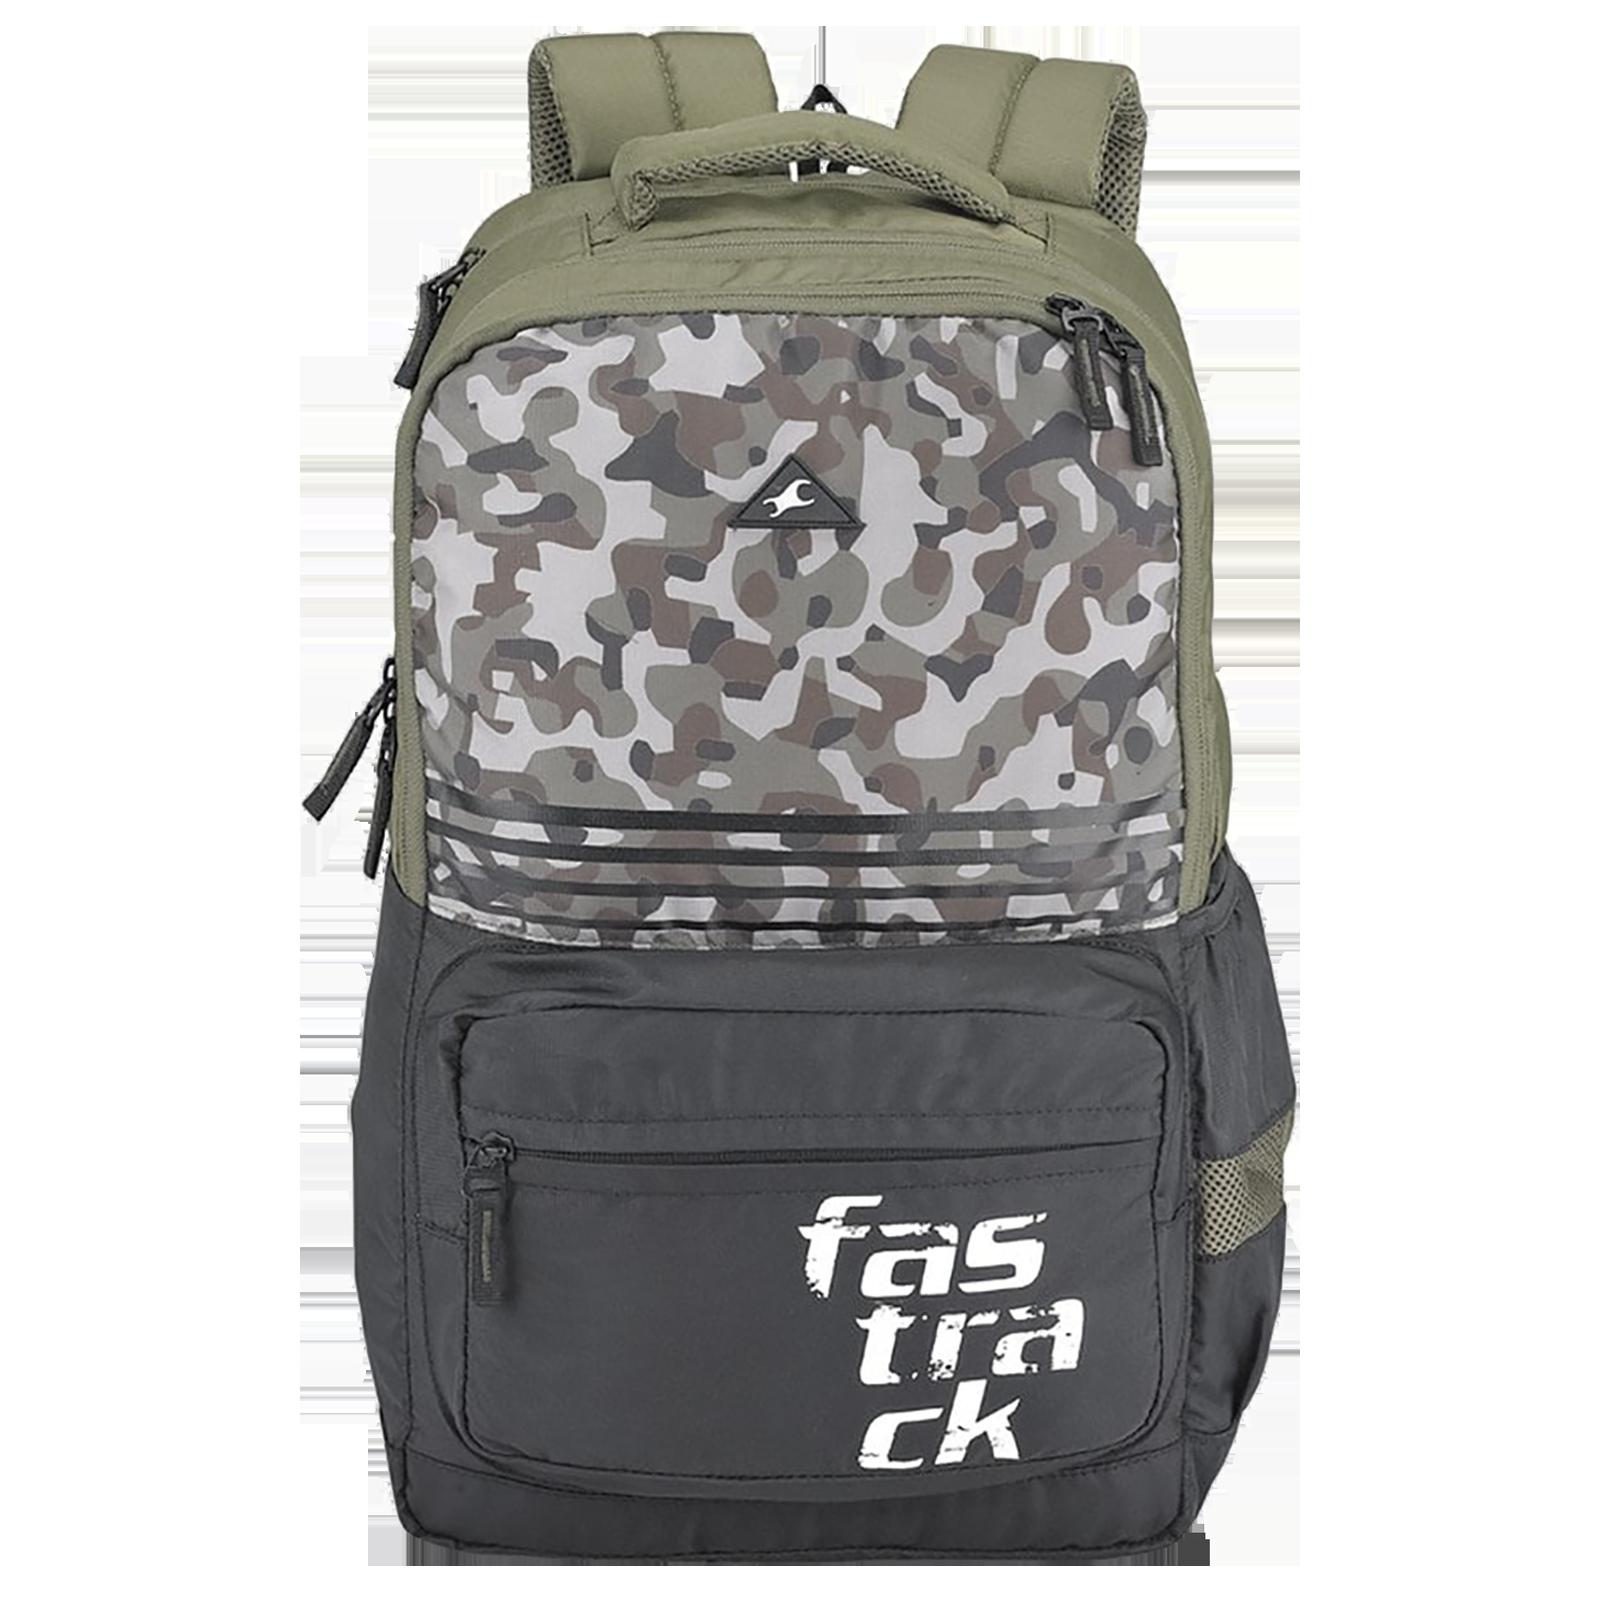 Fastrack Killer 2.0 Ergolight 35 Litres Polyester Backpack (Rain Cover, A0790NOL01, Olive)_1